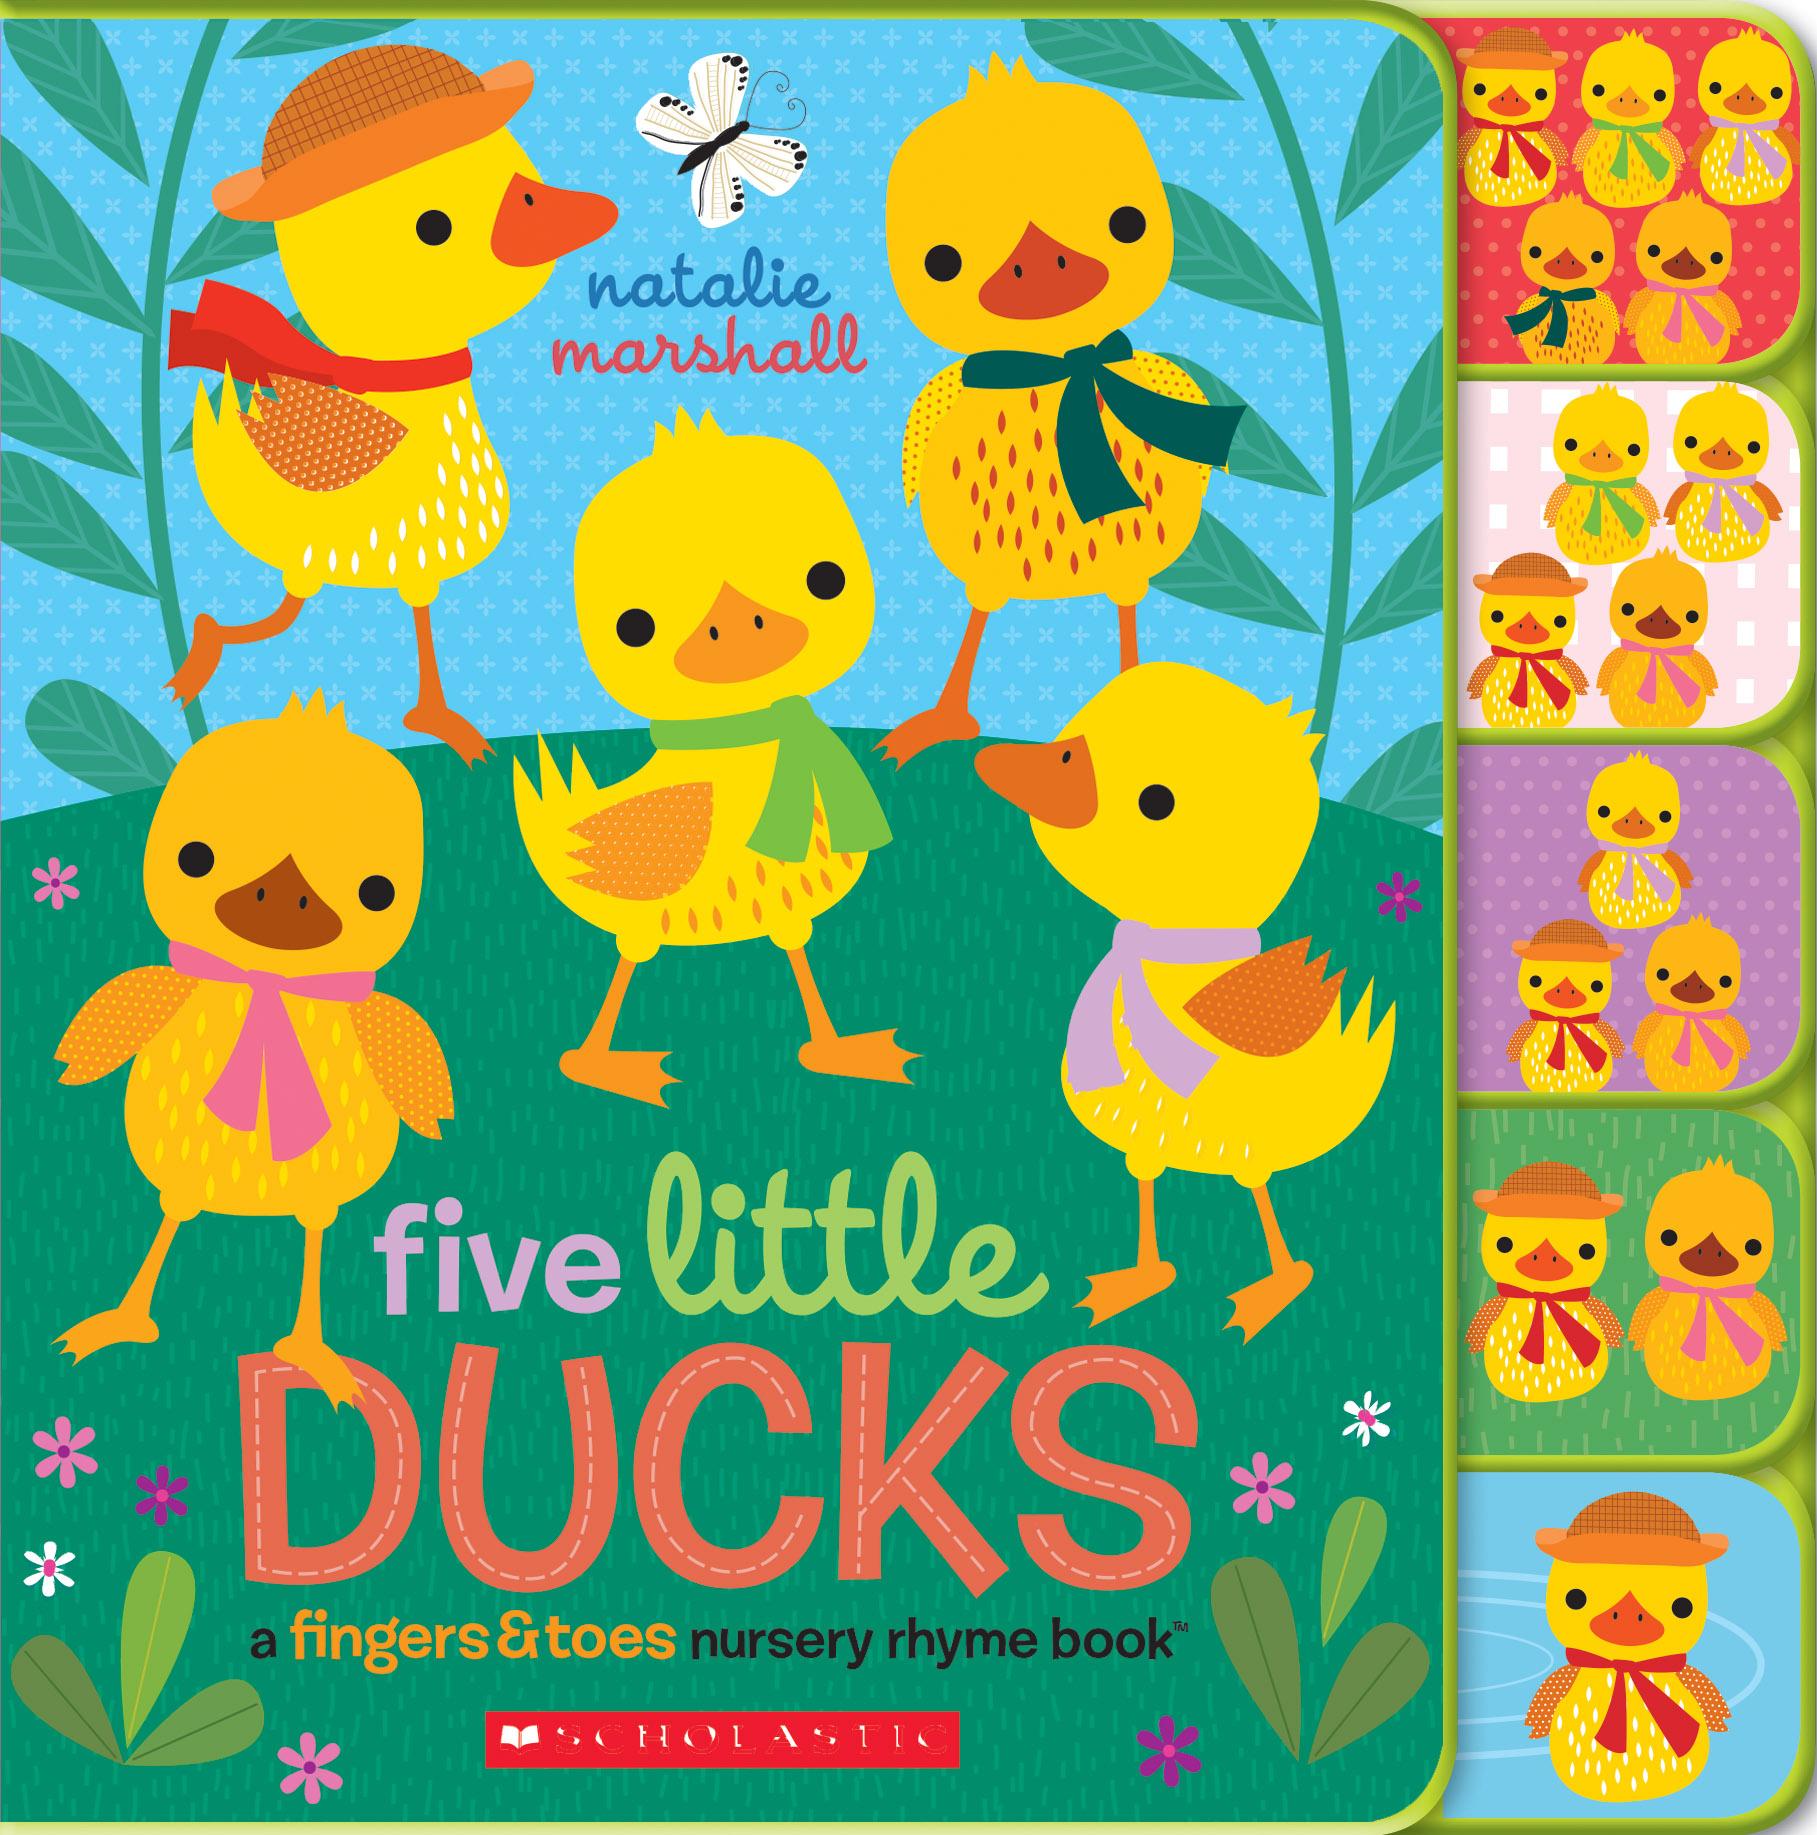 Five Little Ducks: A Fingers & Toes Nursery Rhyme Book